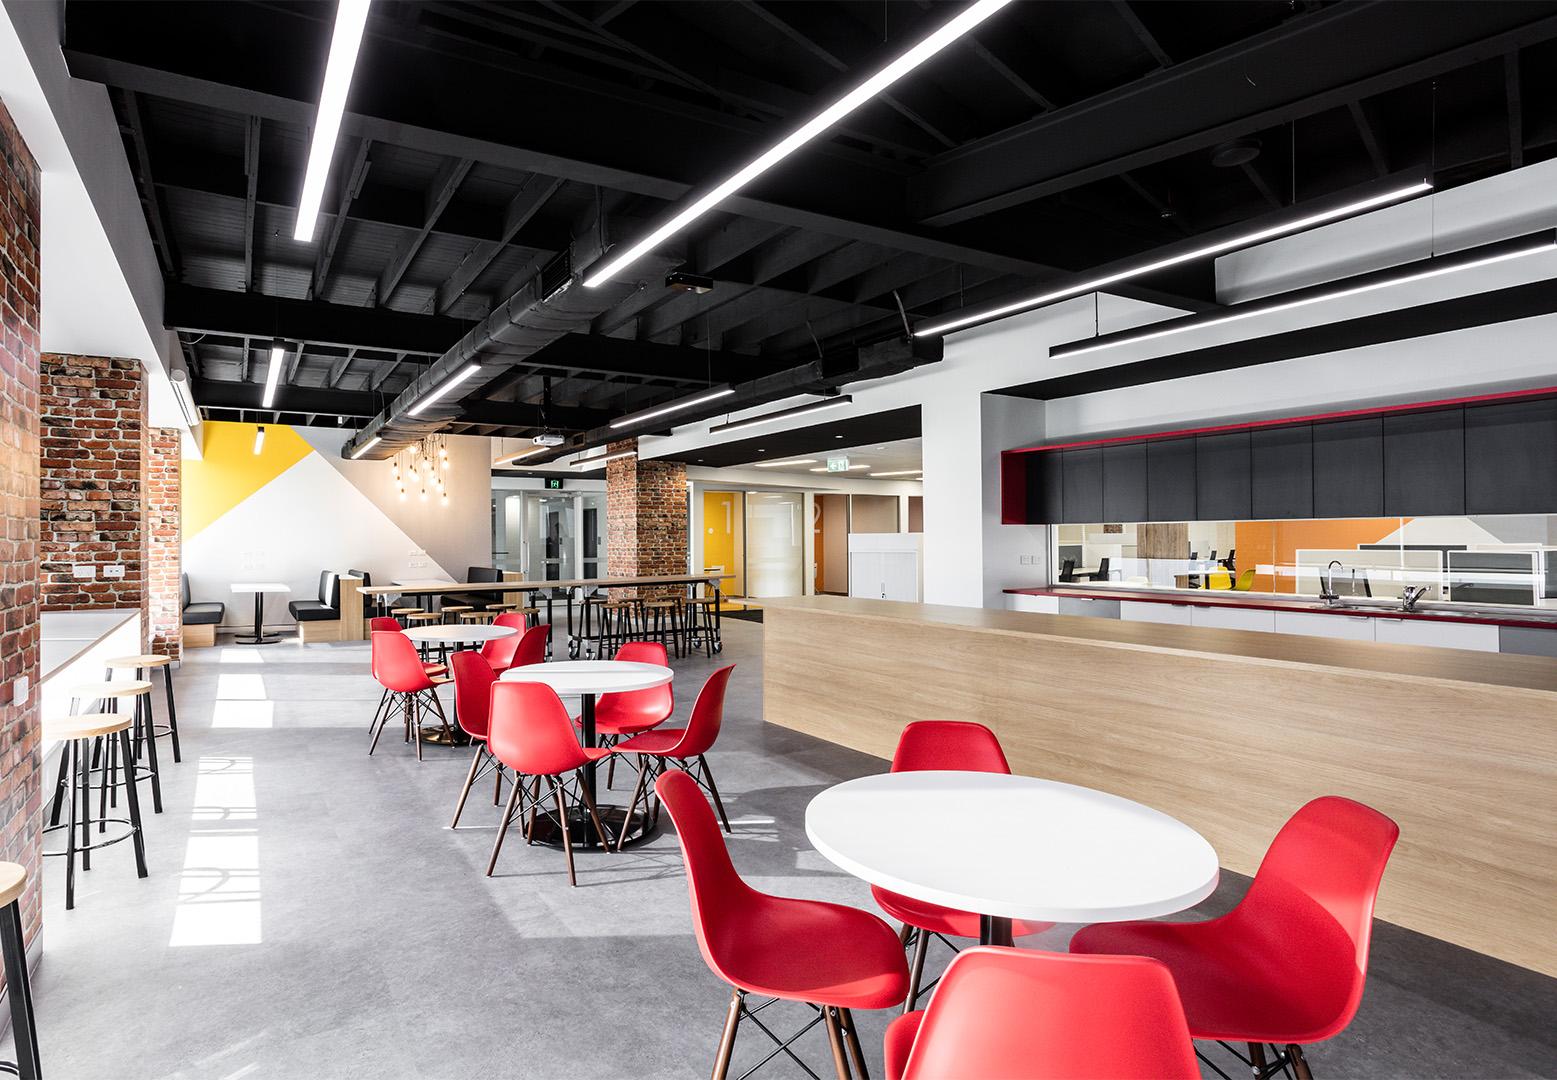 Archway - LGAQ - Lunchroom 01.jpg